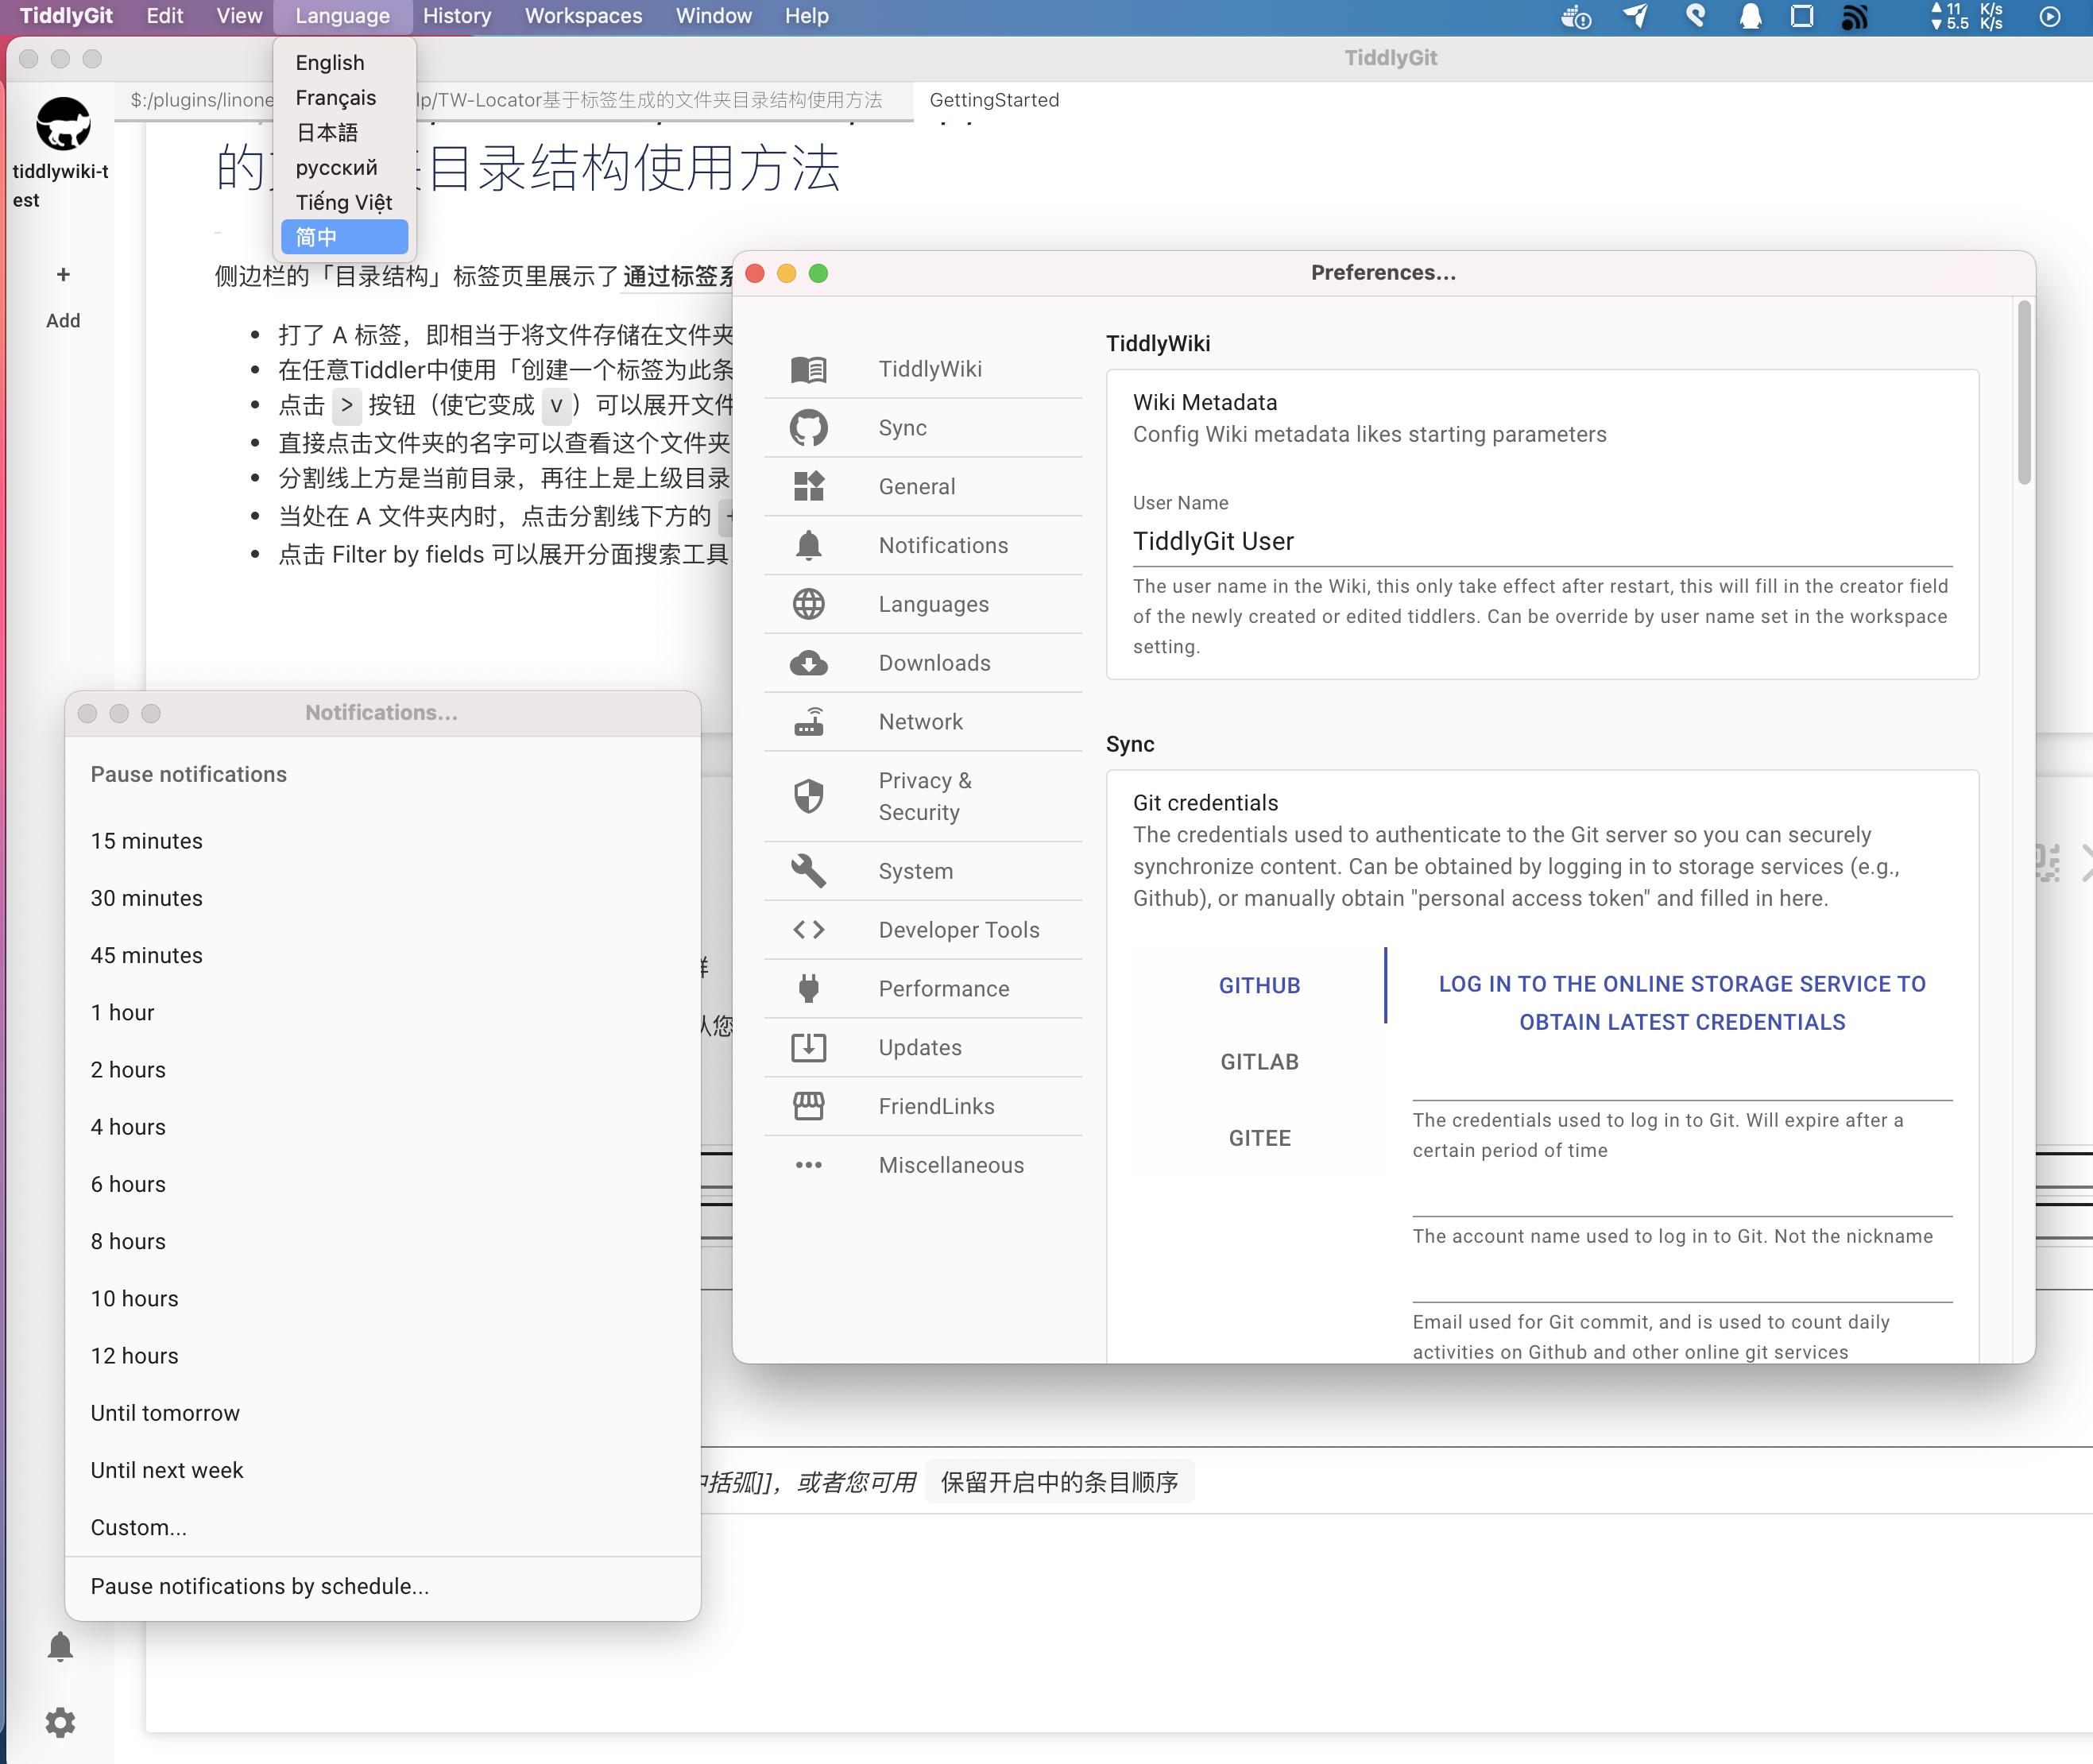 Screenshot of preference